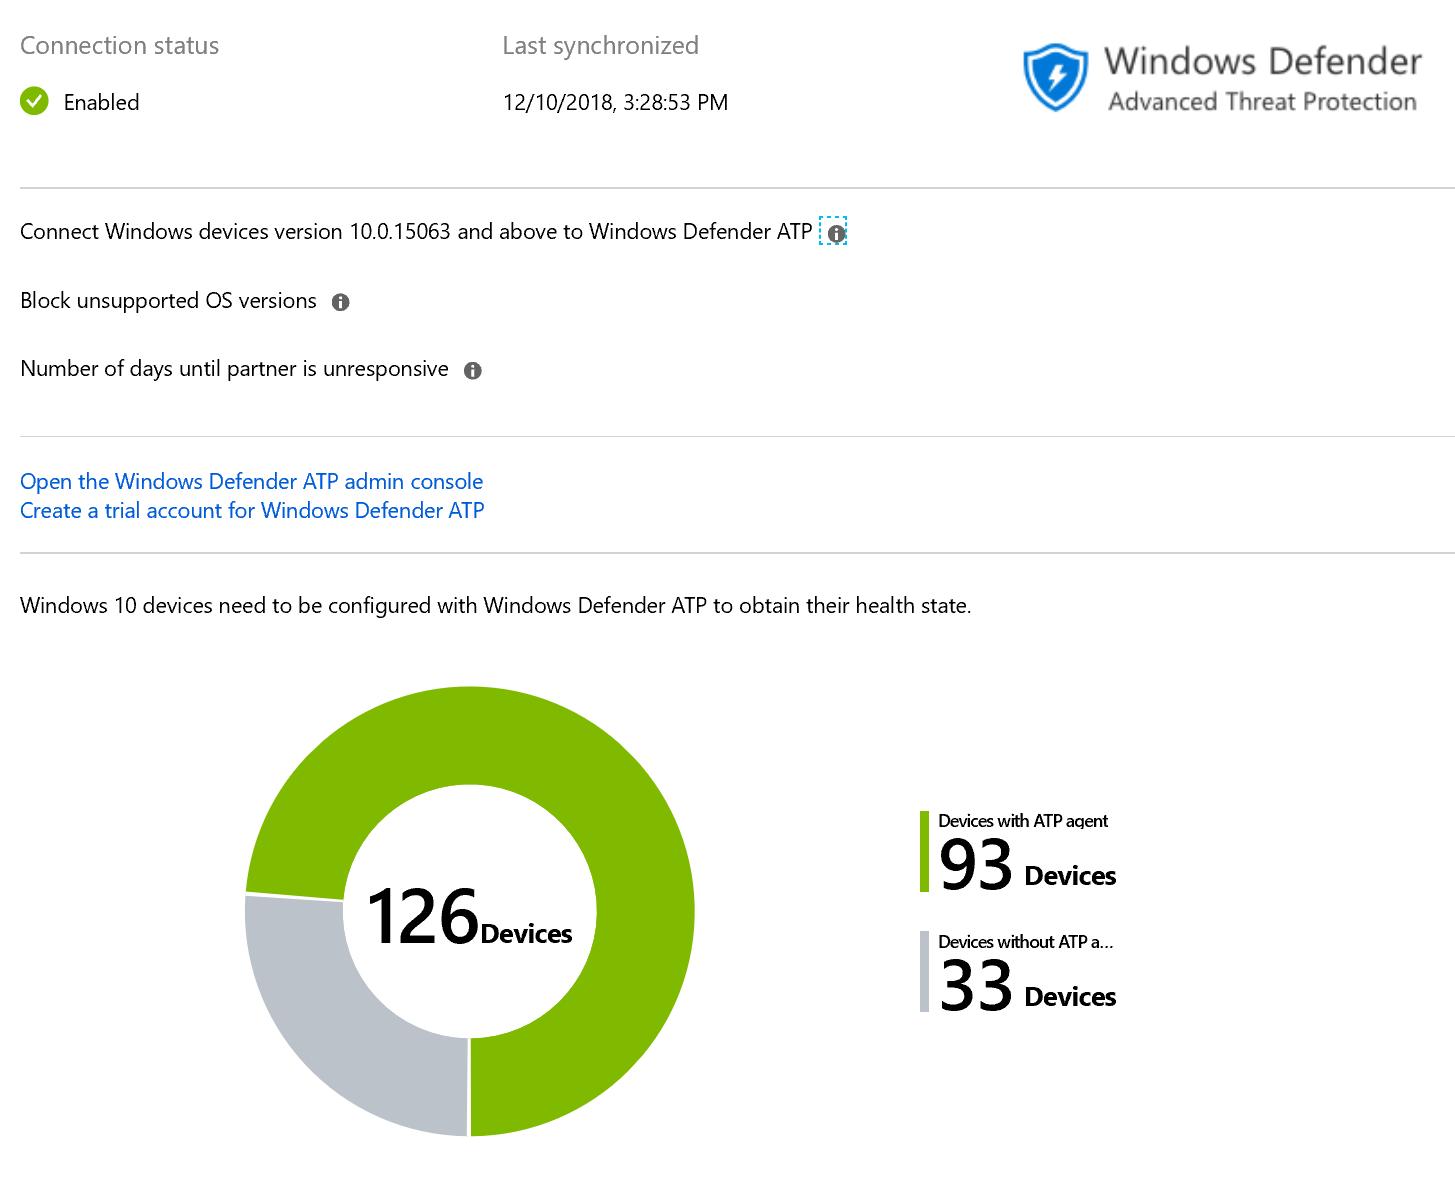 Windows Defender ATP: Onboarding your Windows 10 endpoints